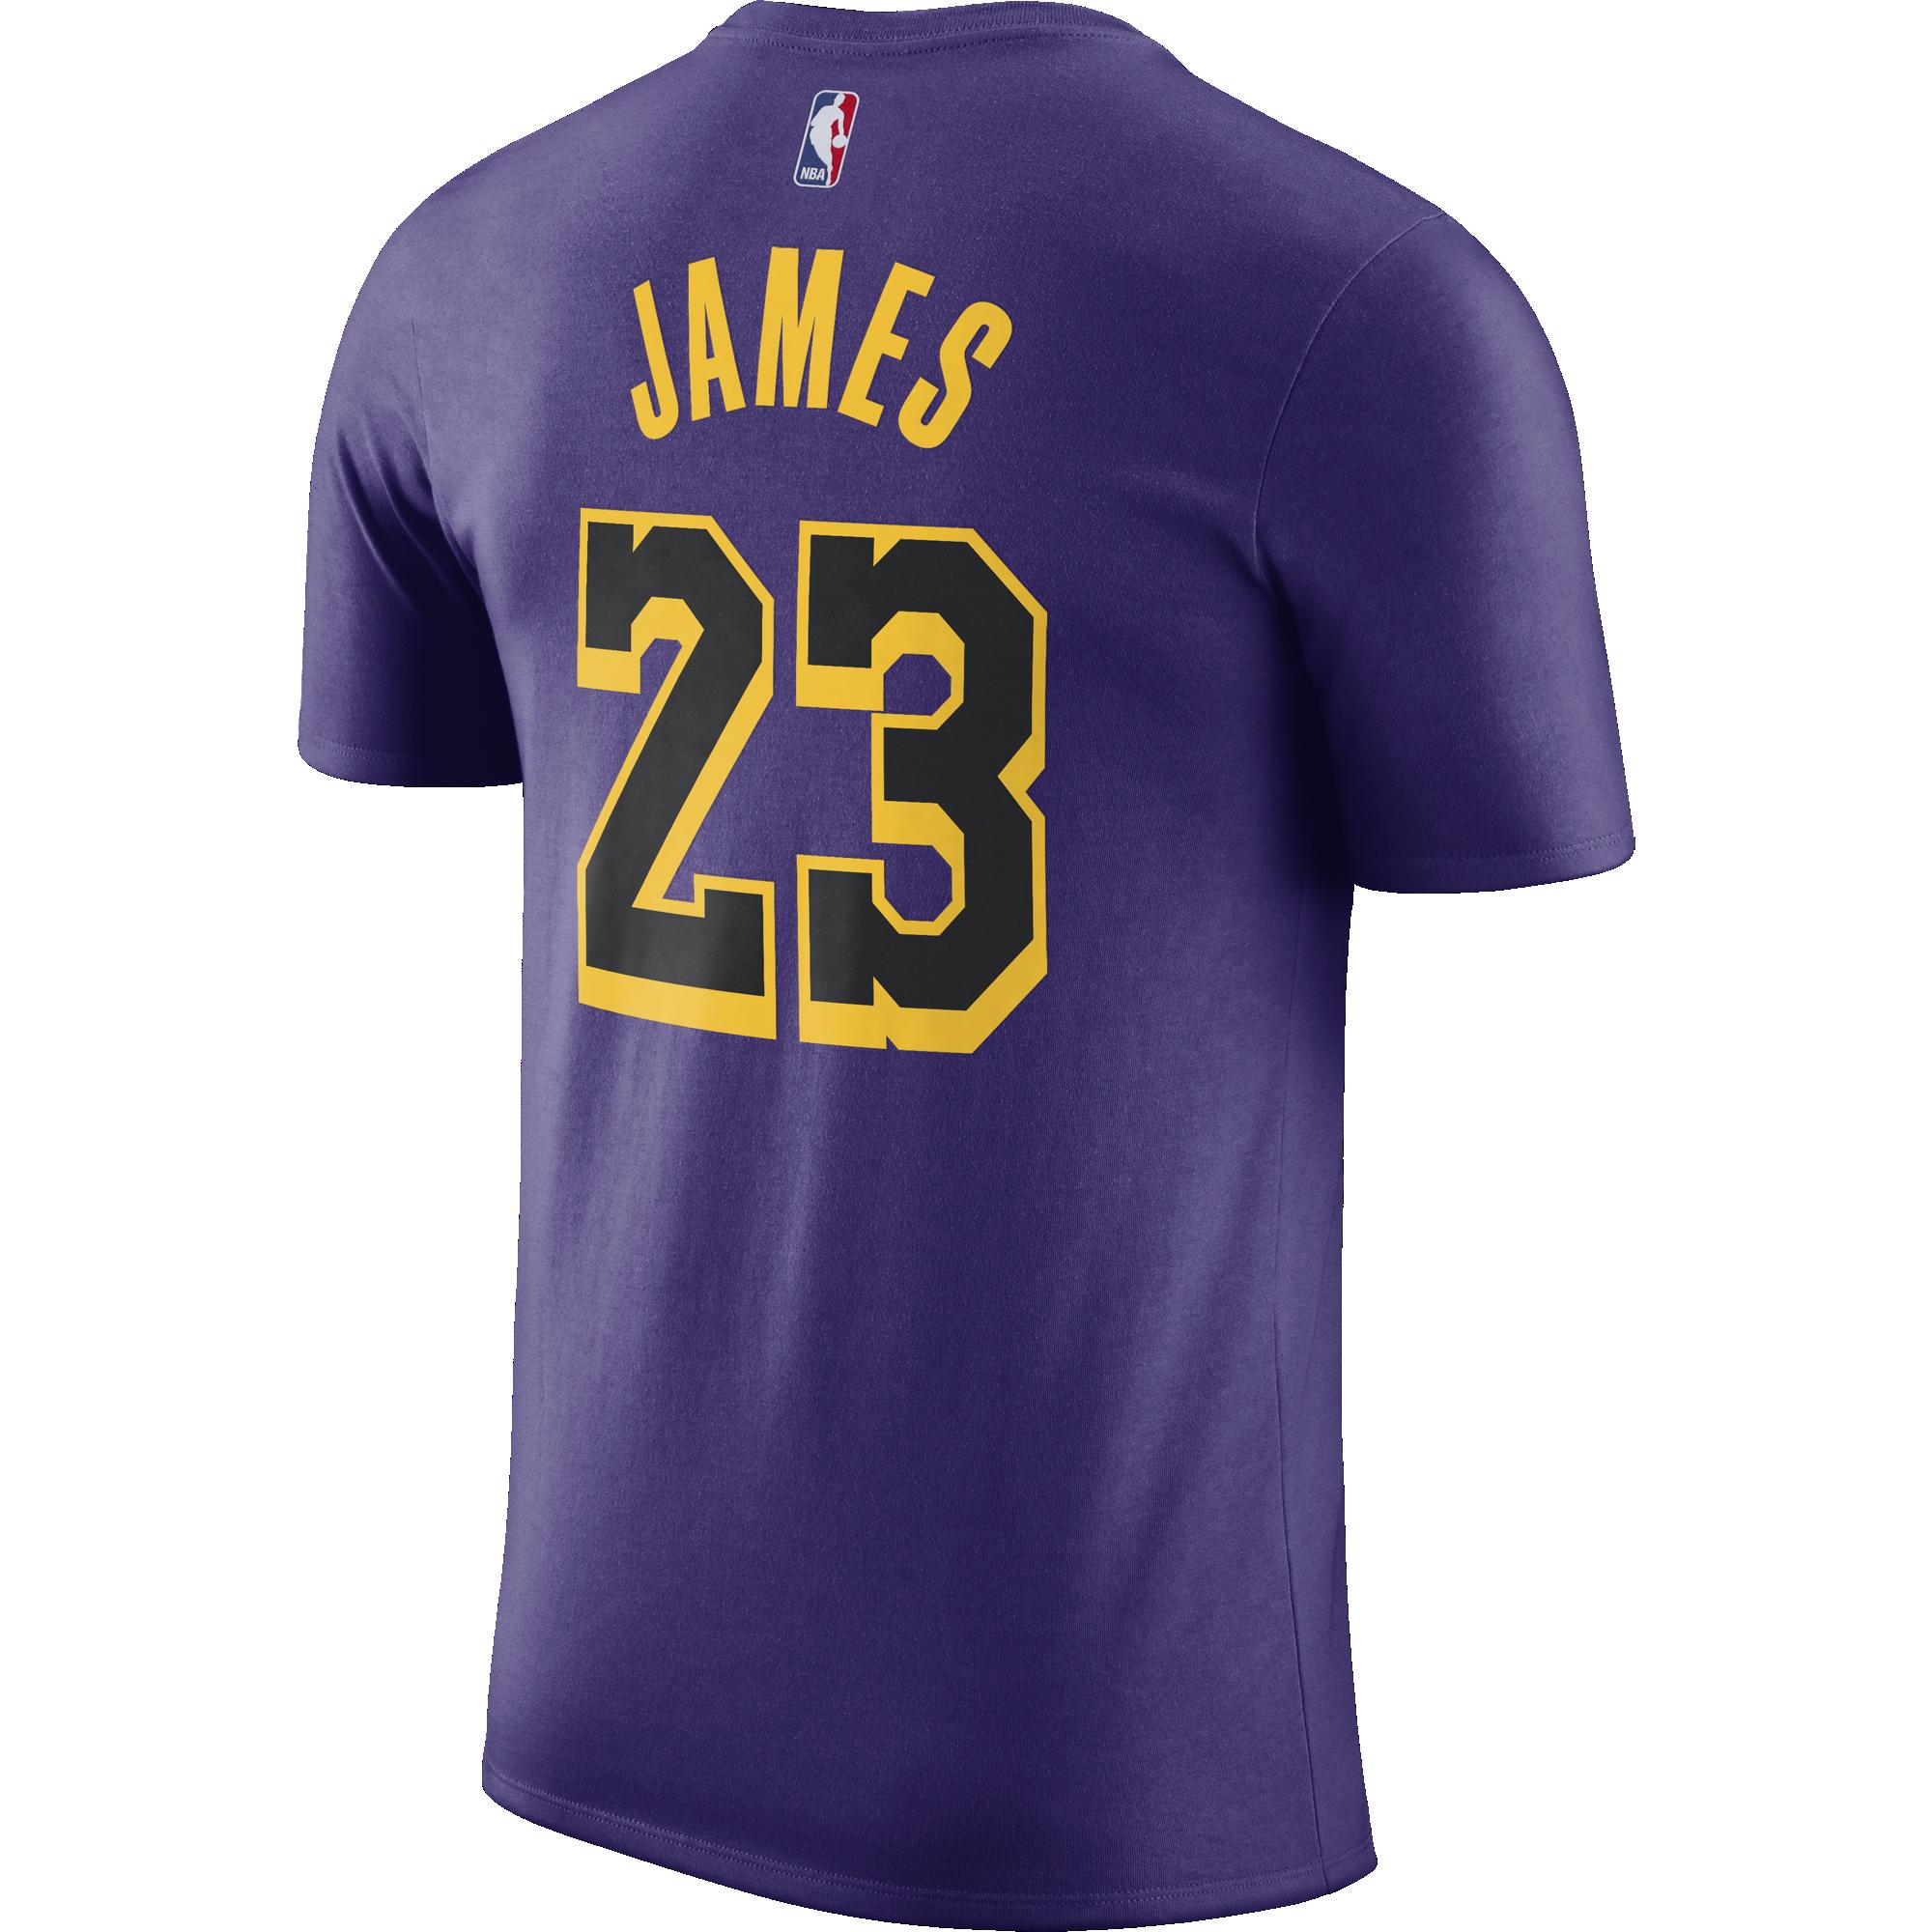 3d04ef4397b NIKE NBA LOS ANGELES LAKERS LEBRON JAMES DRY TEE for £30.00 ...